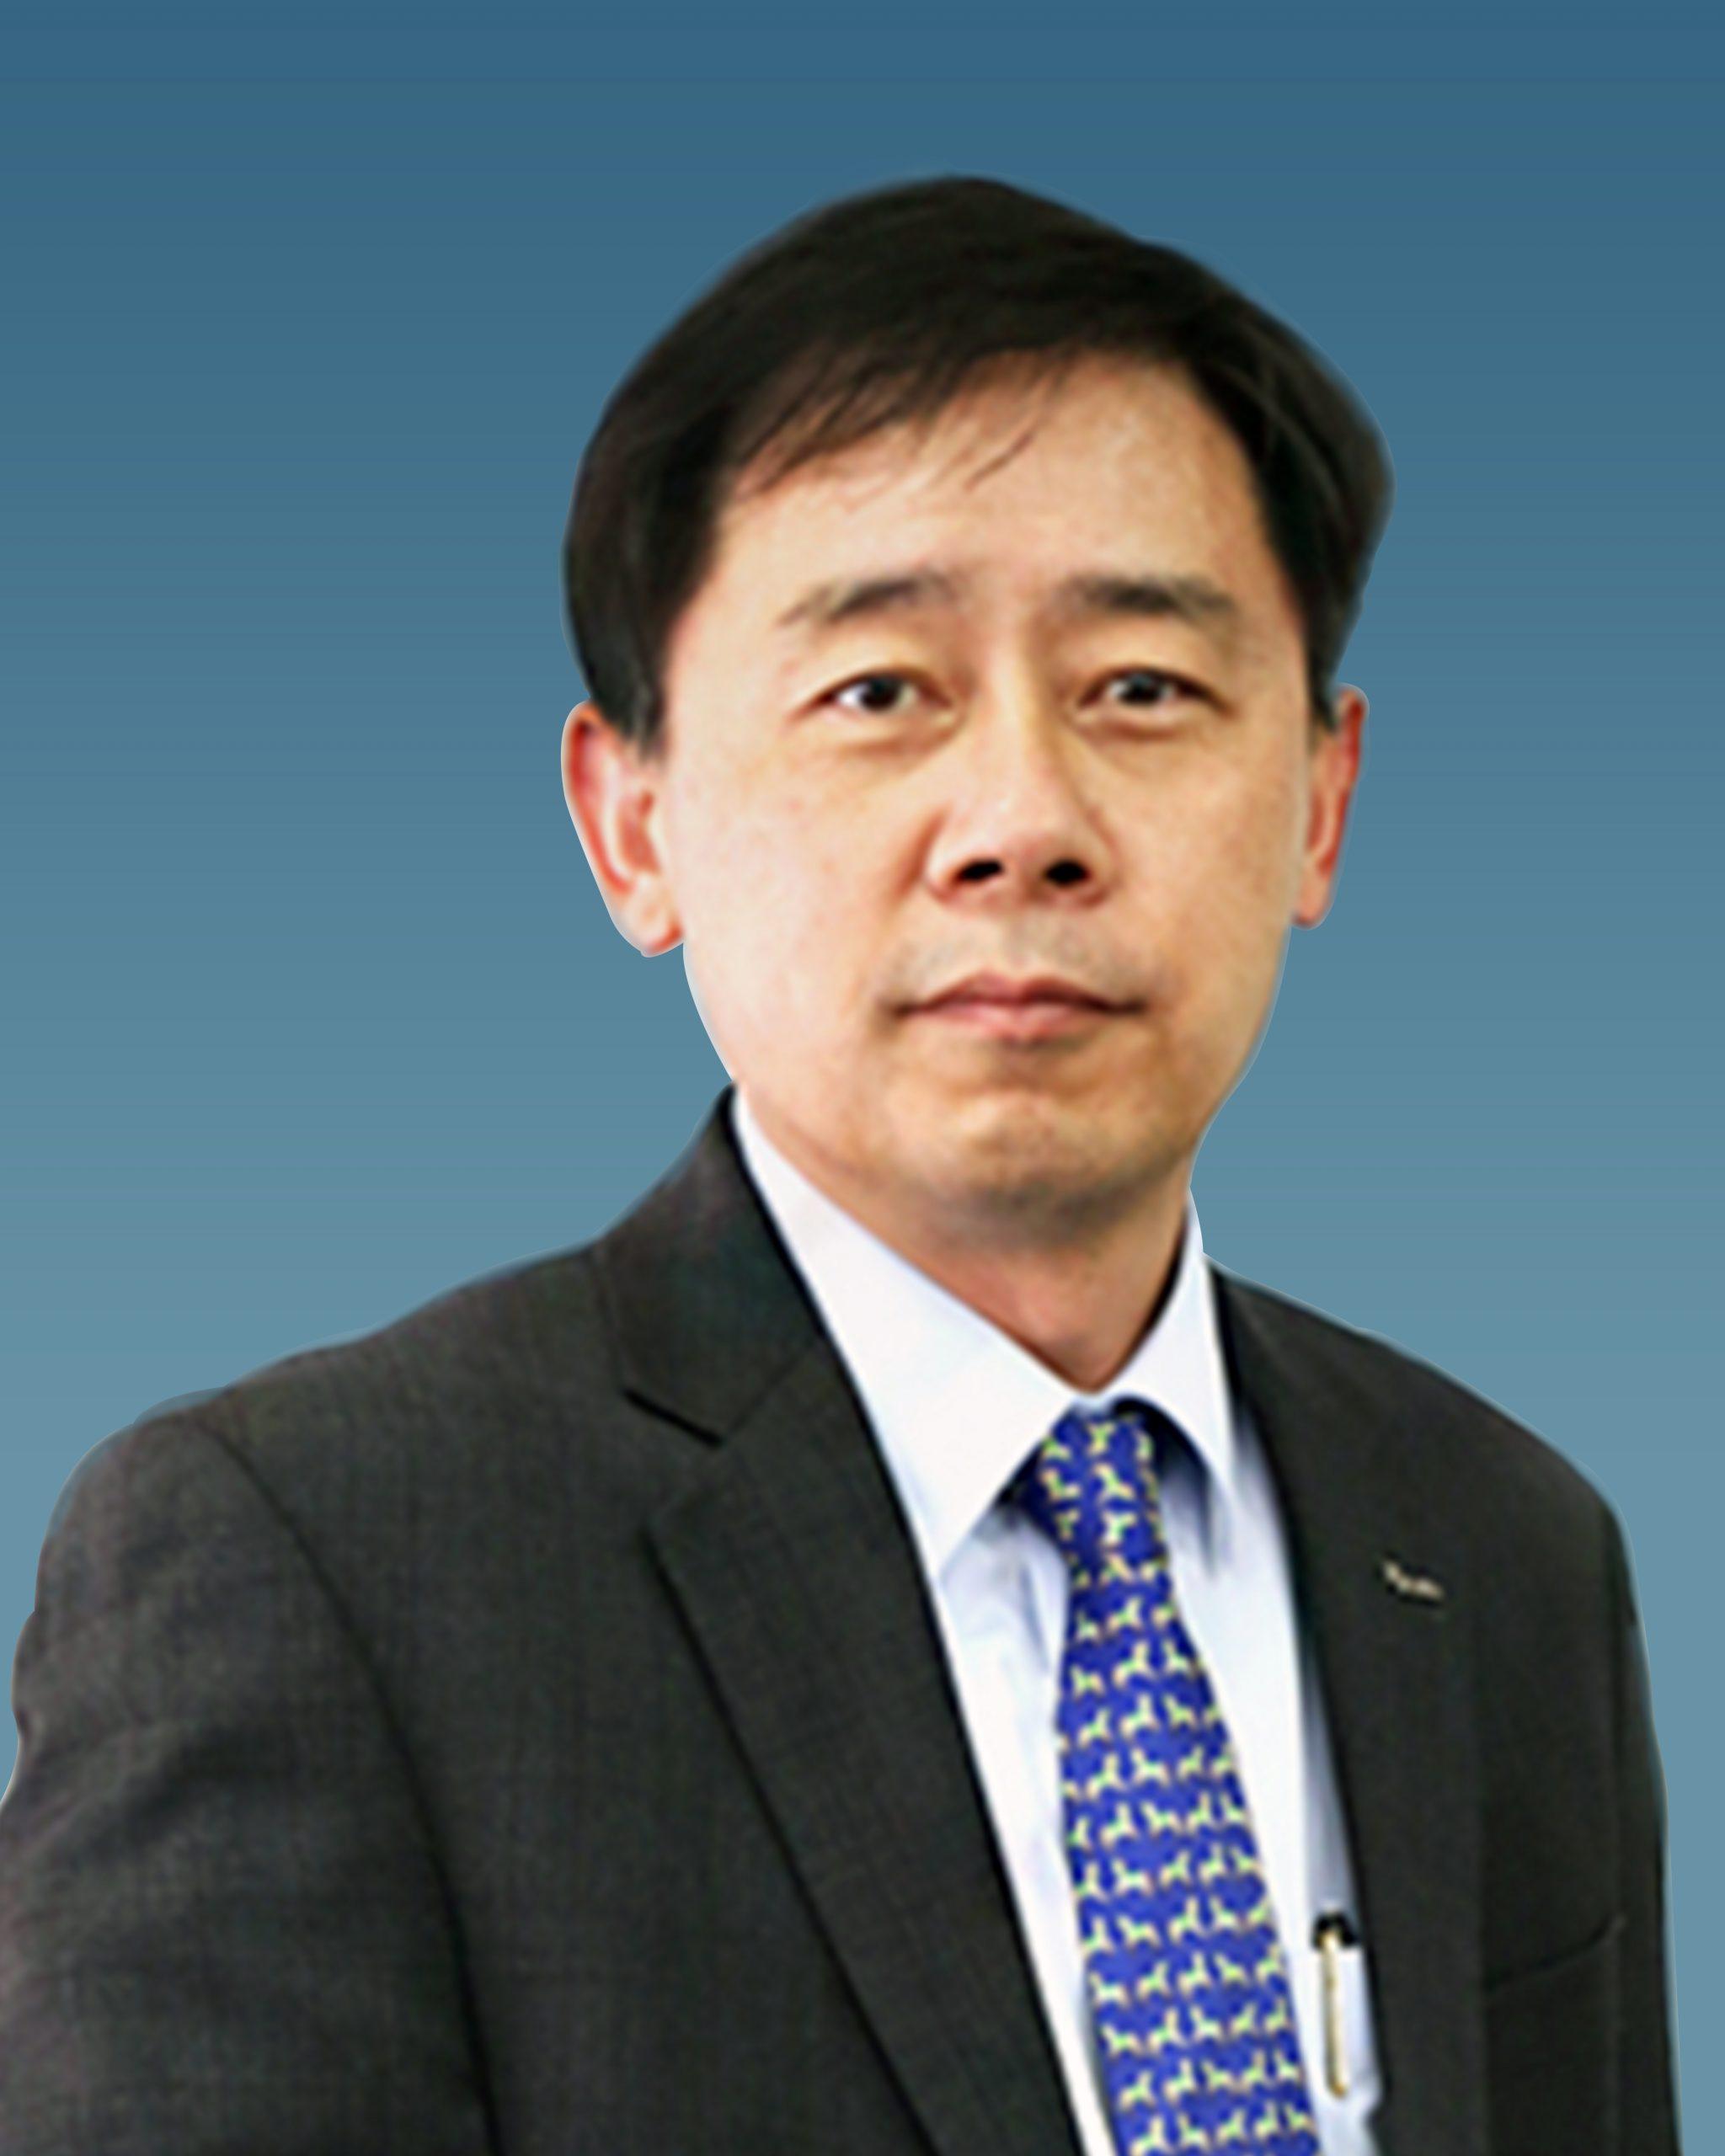 Mr. Seong Hyeon Cho